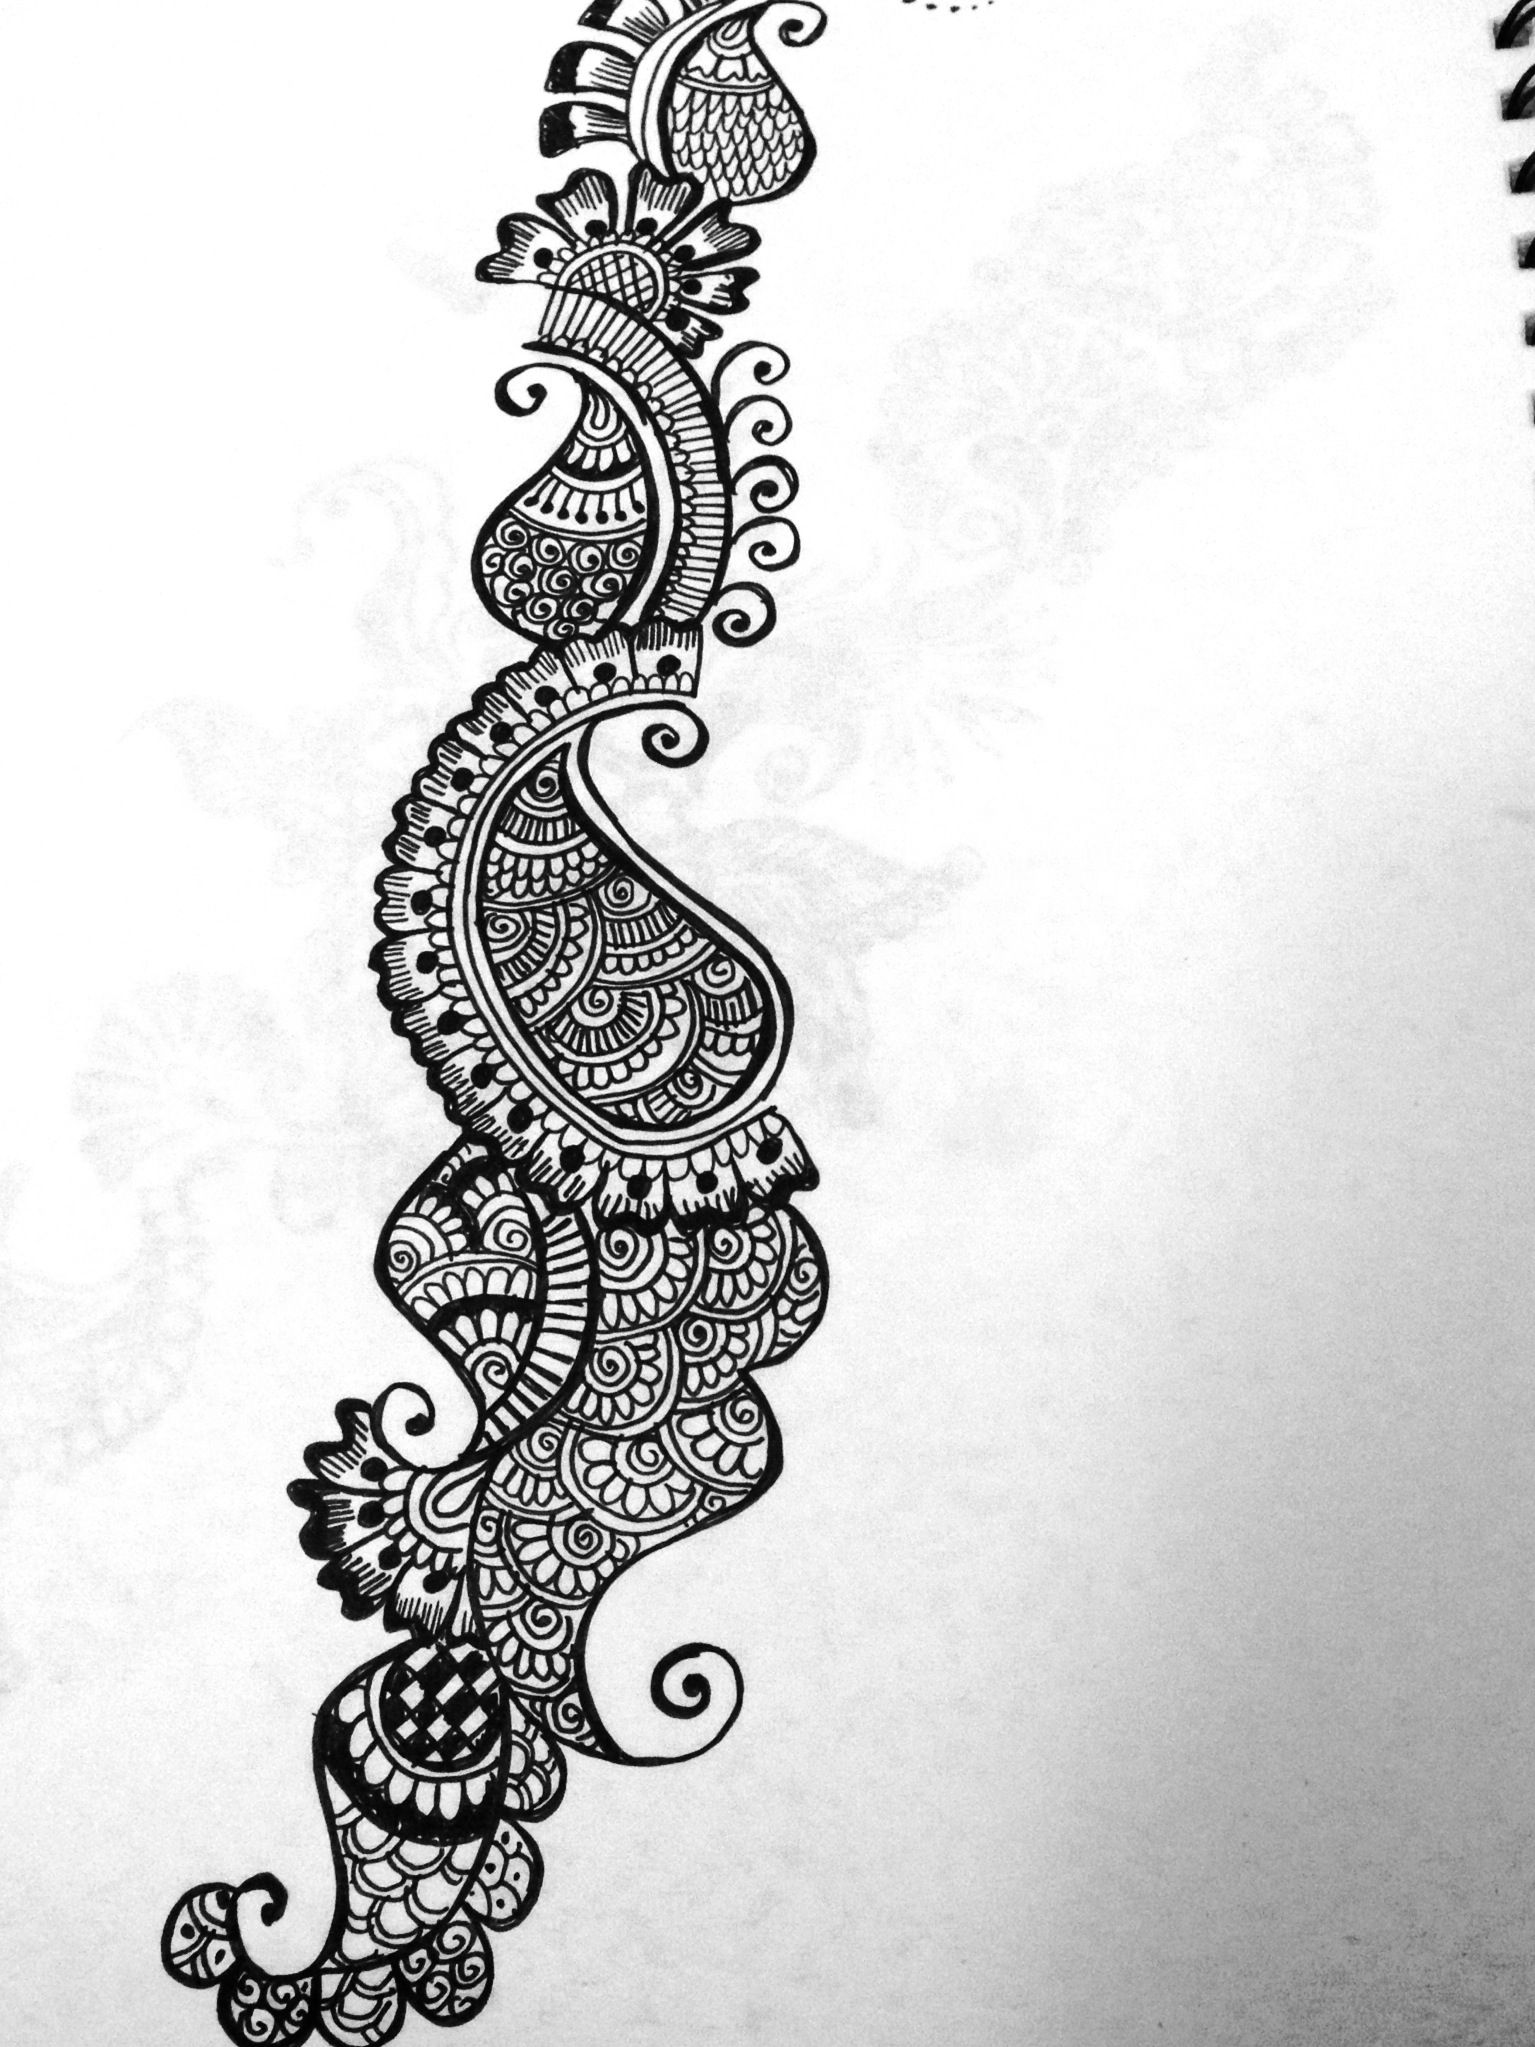 Henna sketches | Mehndi design pictures, Arabic mehndi ...